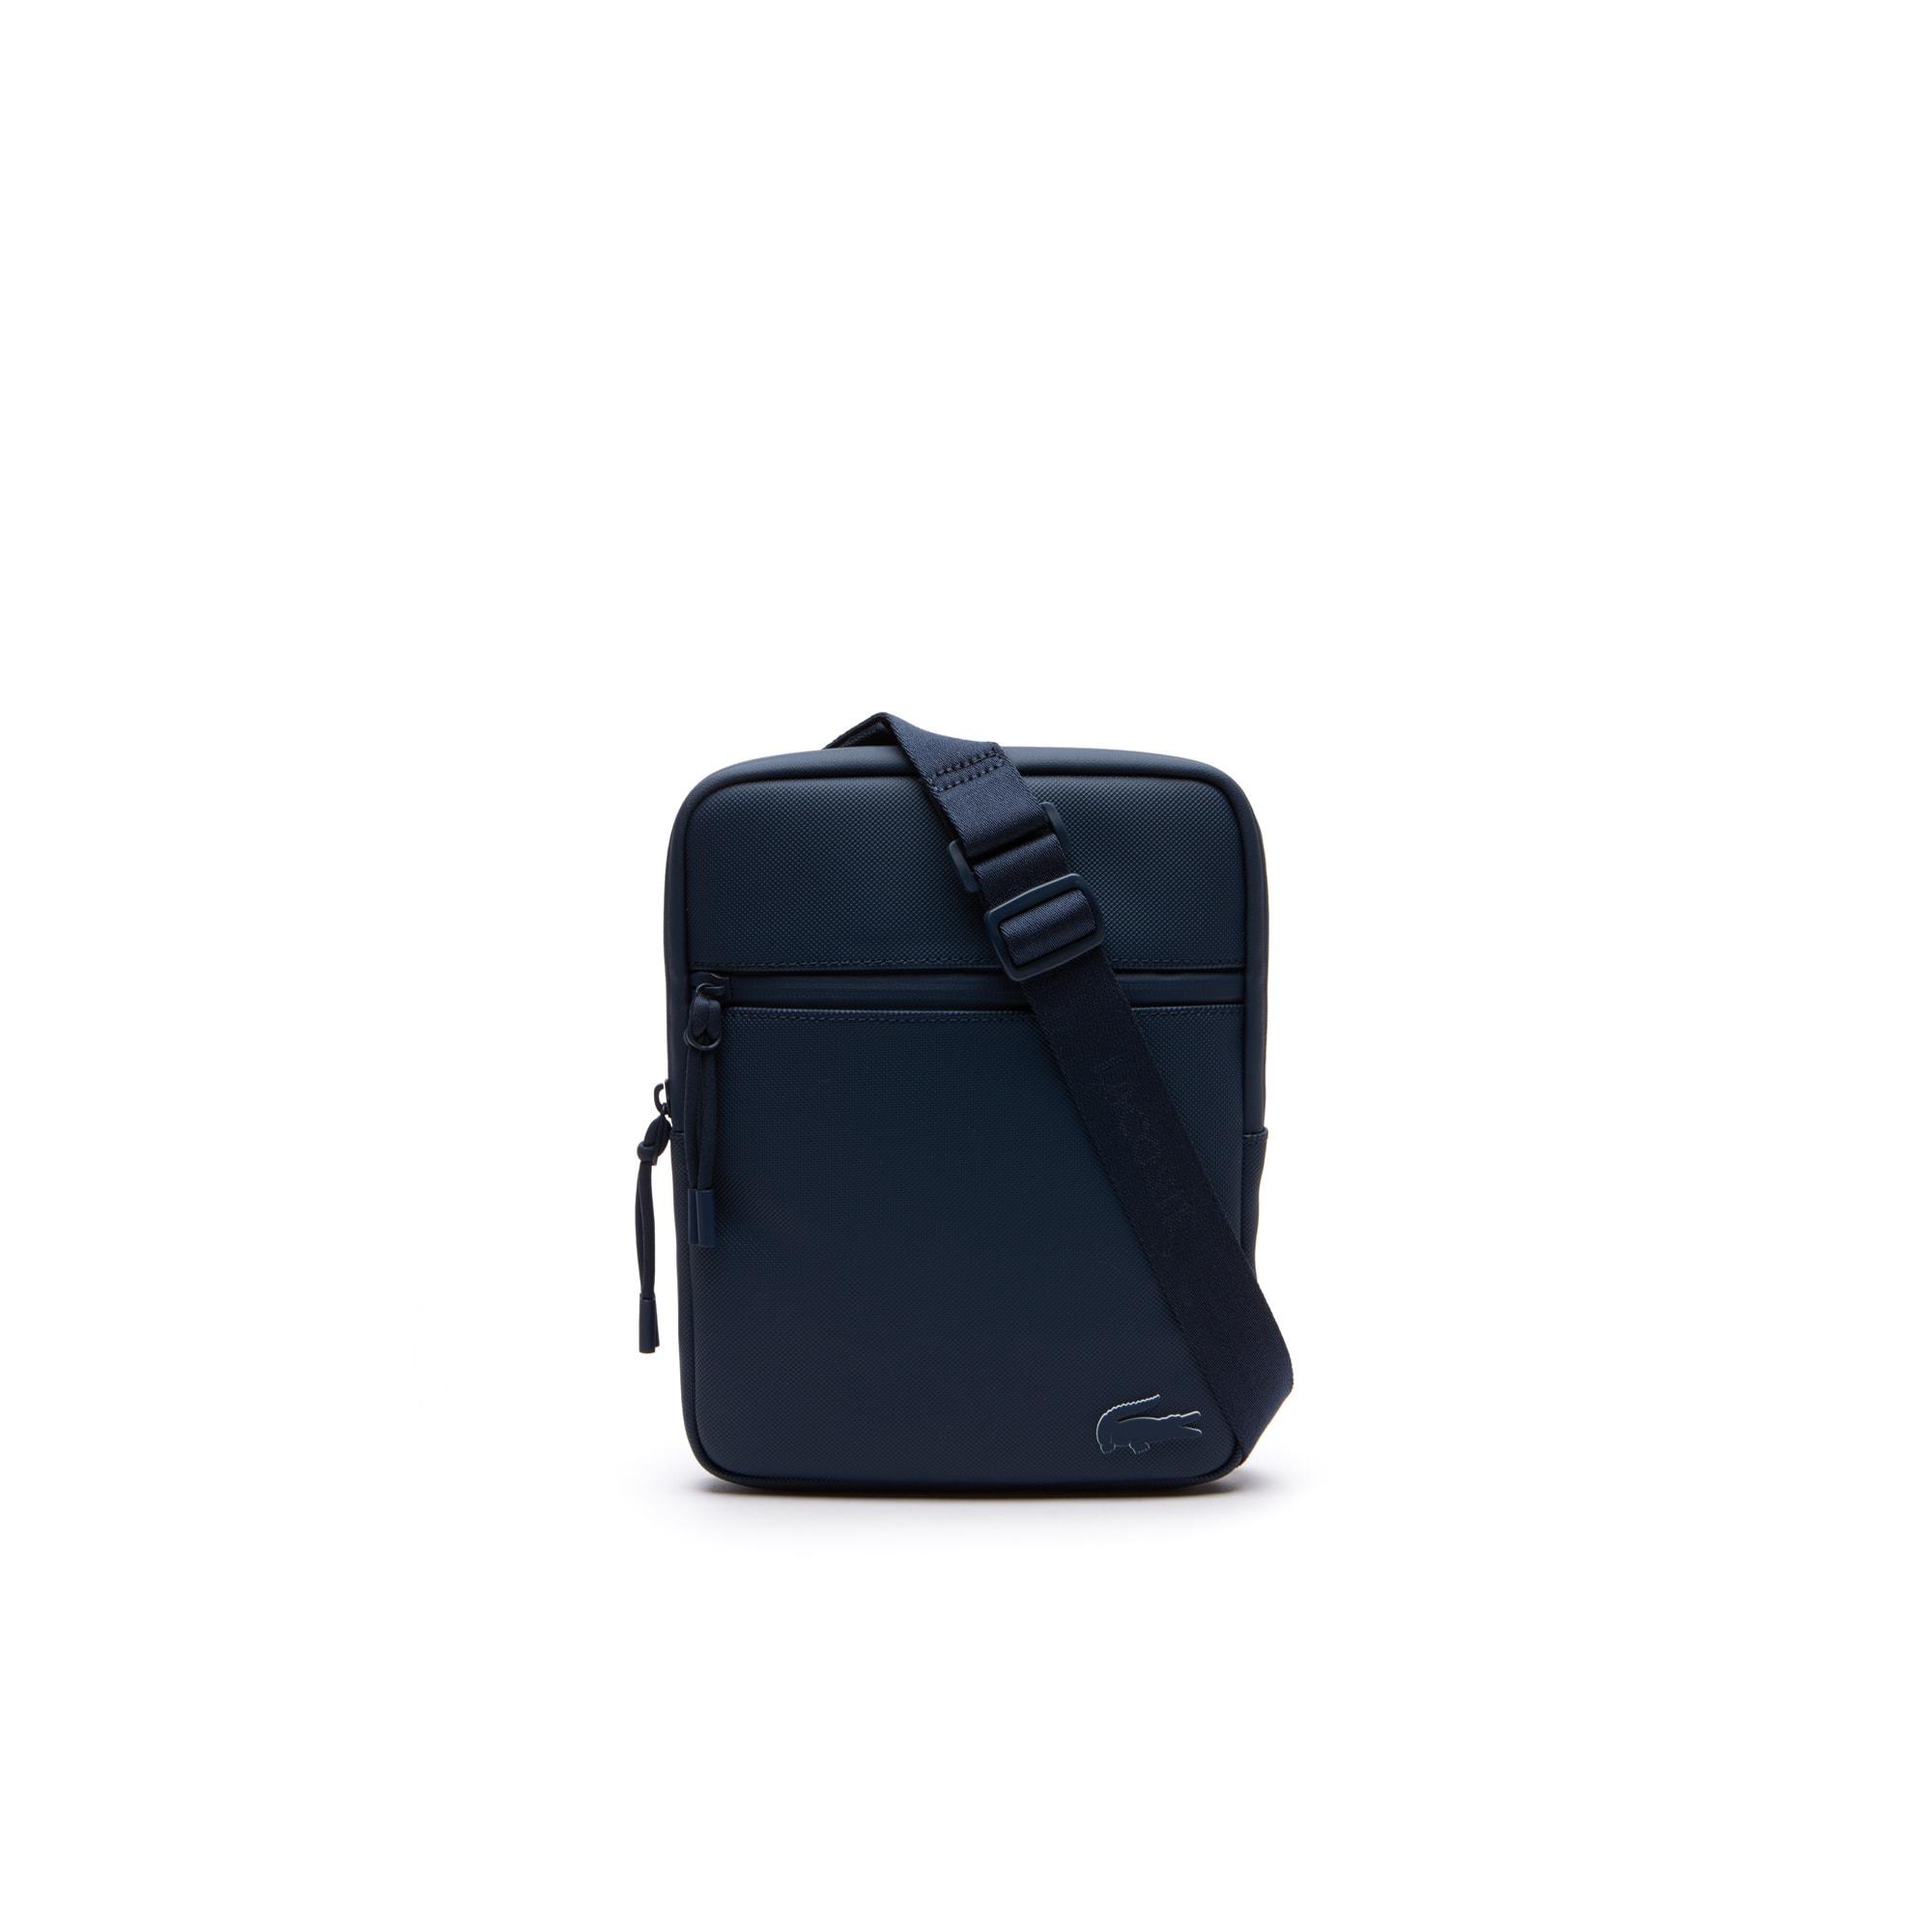 Mala com fecho L.12.12 Concept lisa e monocromática em Petit Piqué